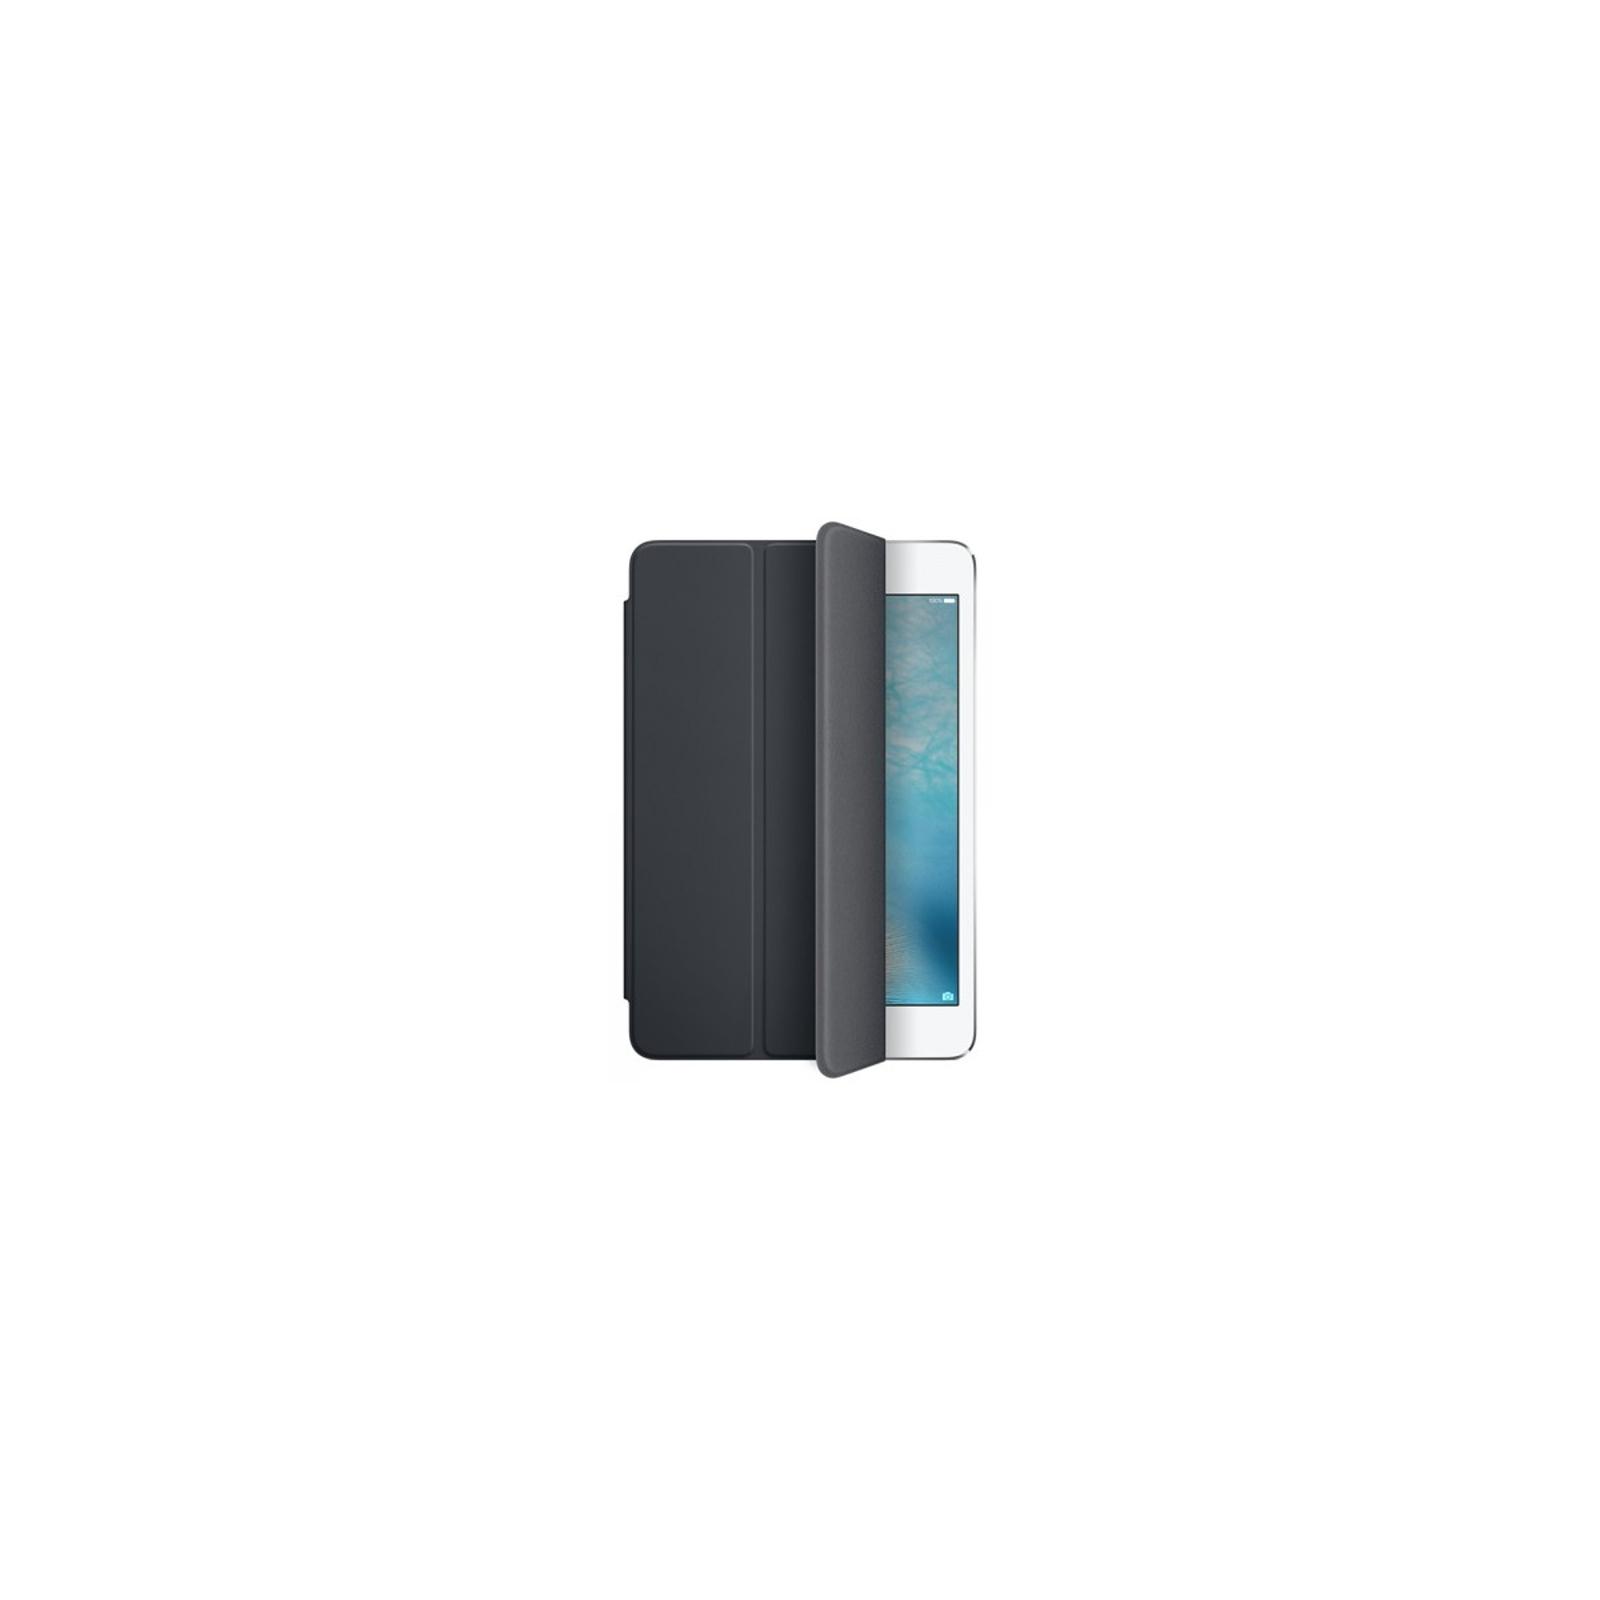 Чехол для планшета Apple Smart Cover для iPad mini 4 Charcoal Gray (MKLV2ZM/A) изображение 3